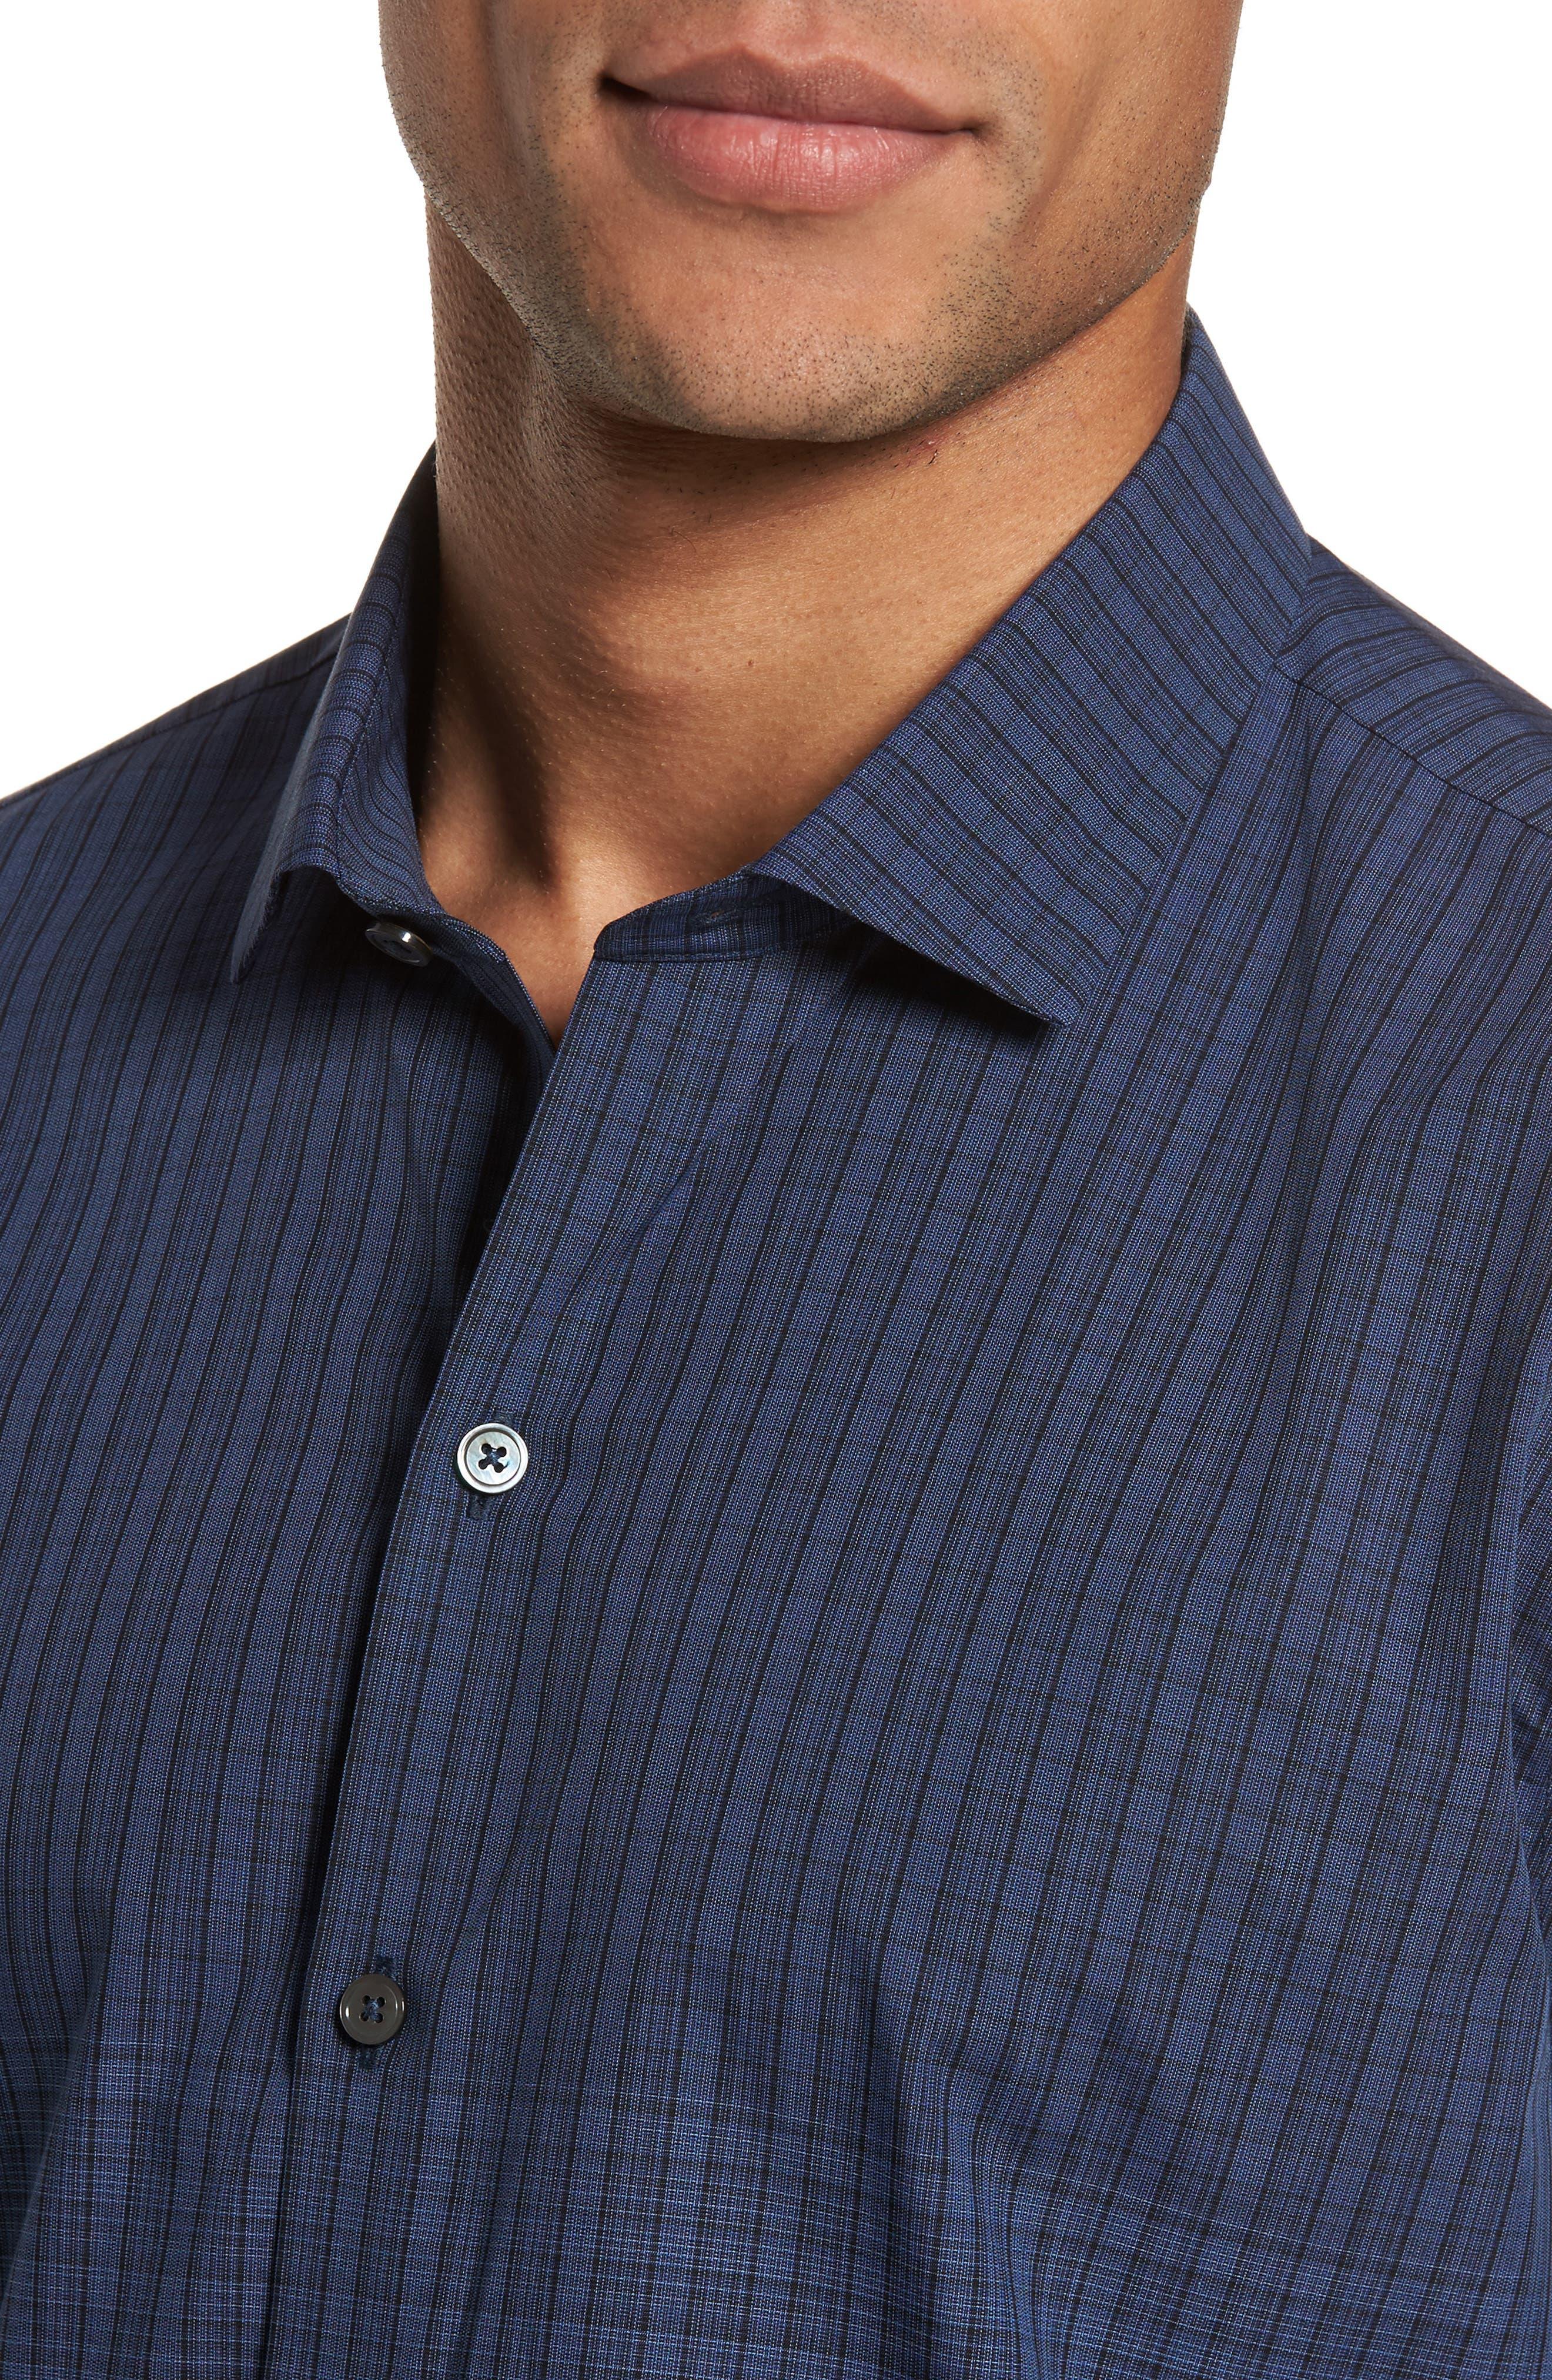 Wein Slim Fit Check Sport Shirt,                             Alternate thumbnail 4, color,                             401